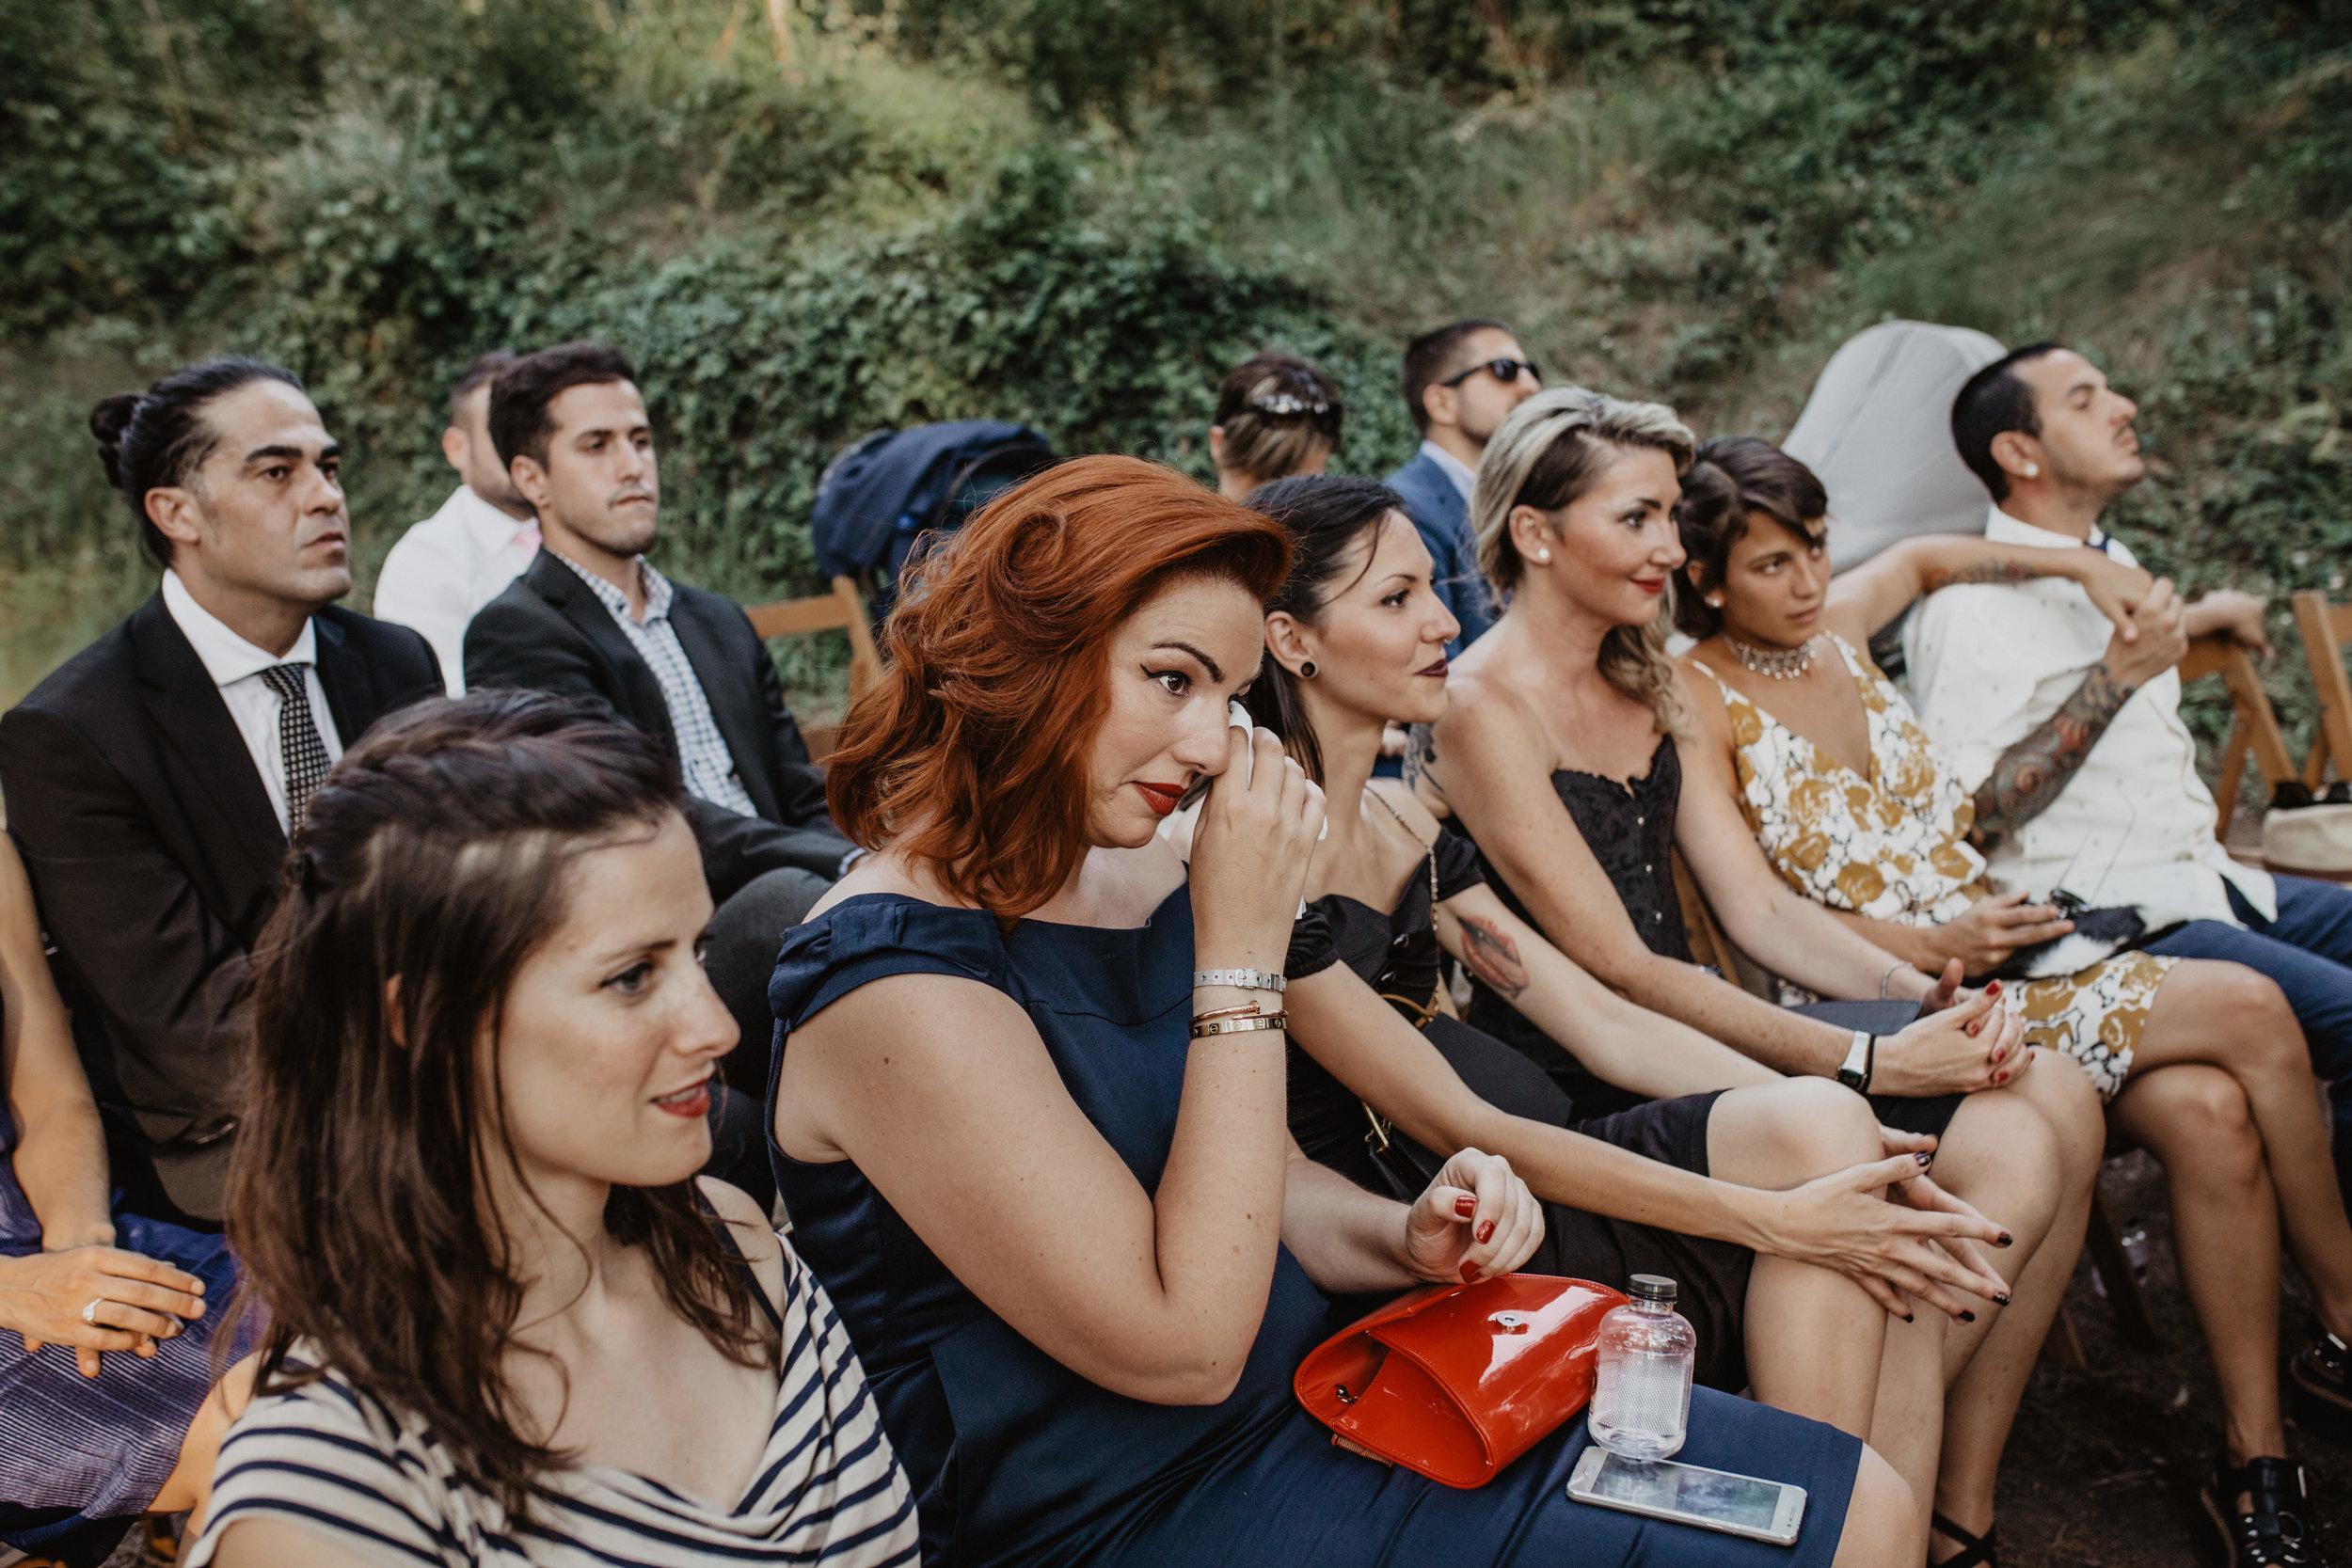 thenortherngirlphotography_photography_thenortherngirl_rebeccascabros_wedding_weddingphotography_masialagarrigadecastelladral_joaniemma_bodaenbarcelona_weddingphotographer_emmaijoan-367.jpg